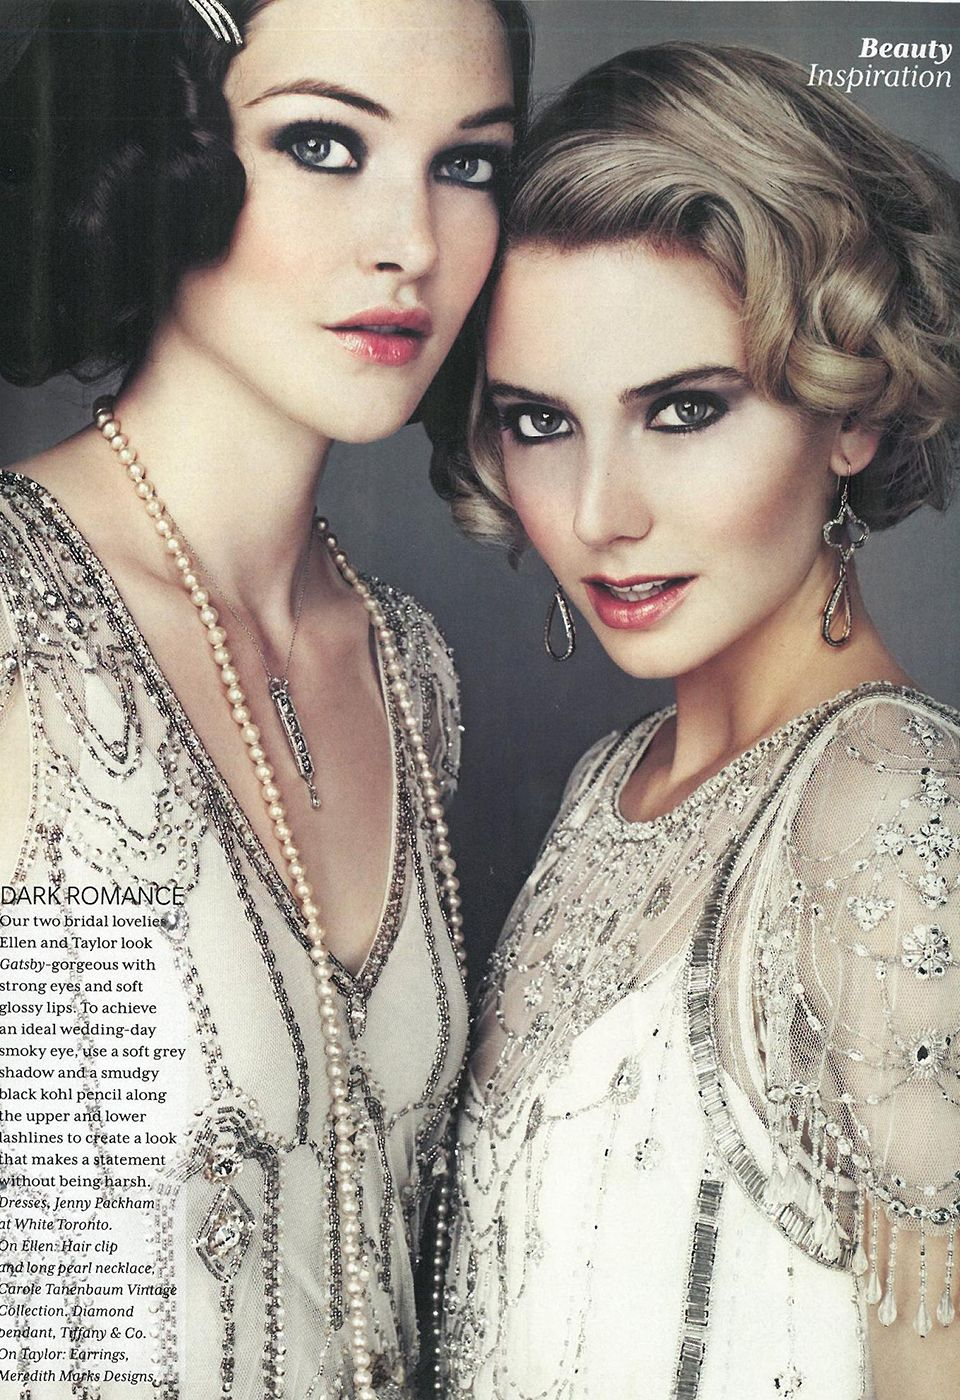 Great gatsby inspired bridesmaid dresses  EDEN u DAMASK PUBLICATION WEDDING BELLS nnypackham